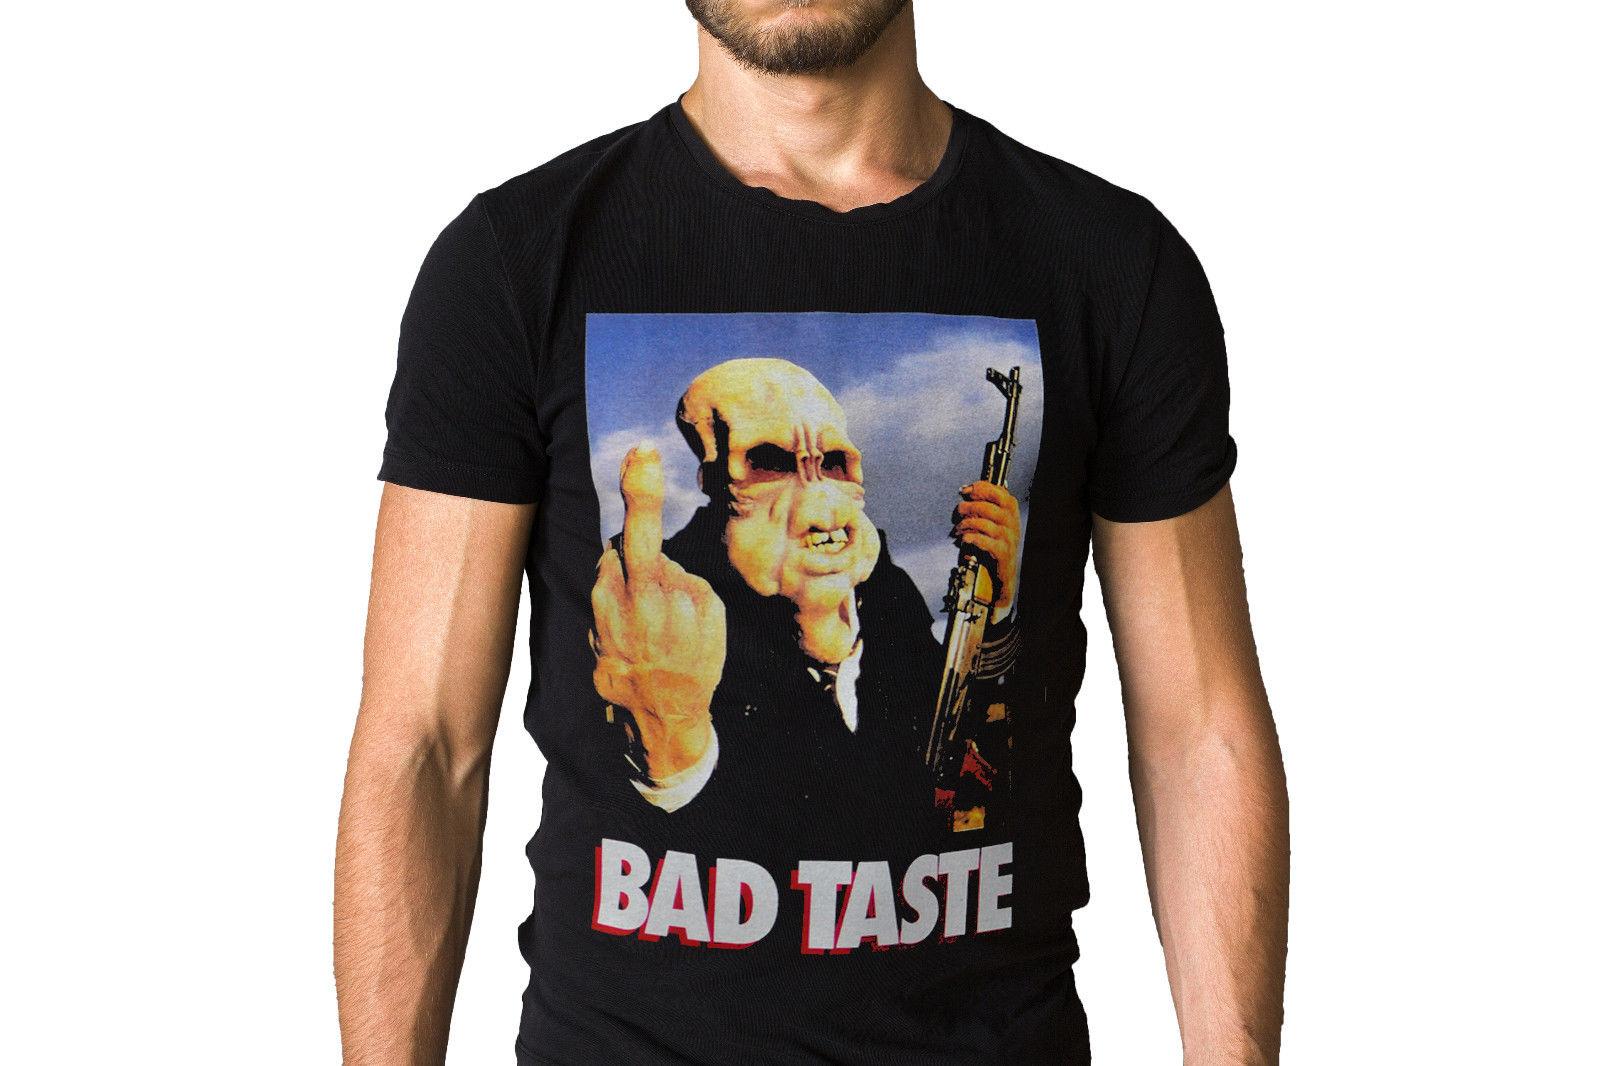 Camiseta con póster de película Bad Taste 1987